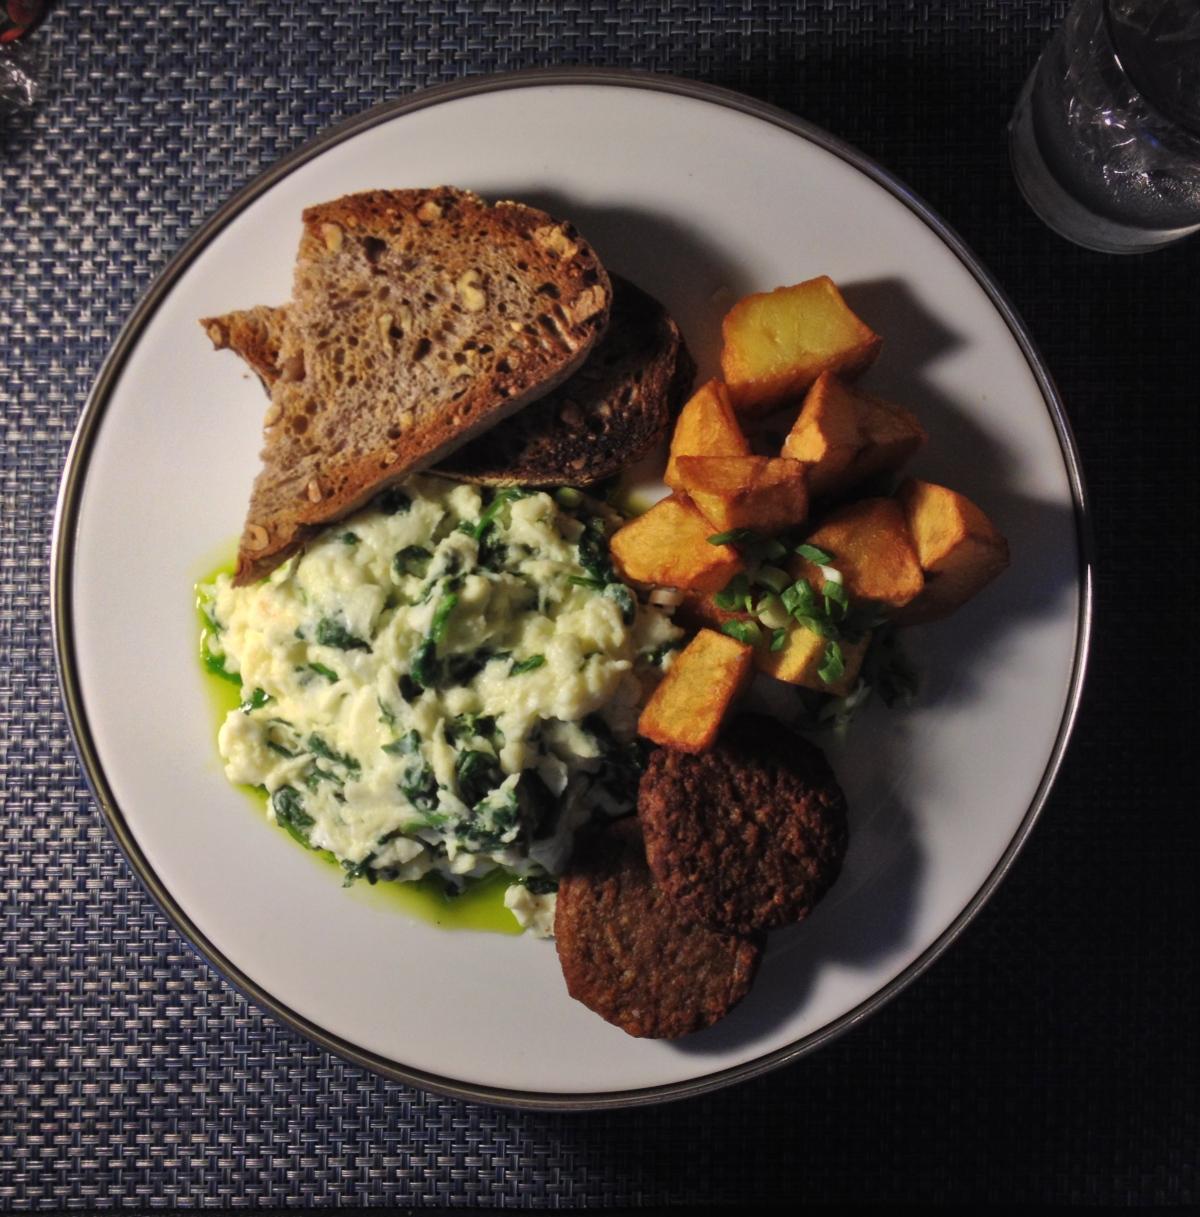 Egg White Scramble, Walnut Bread, Veggie Sausage,Potatoes